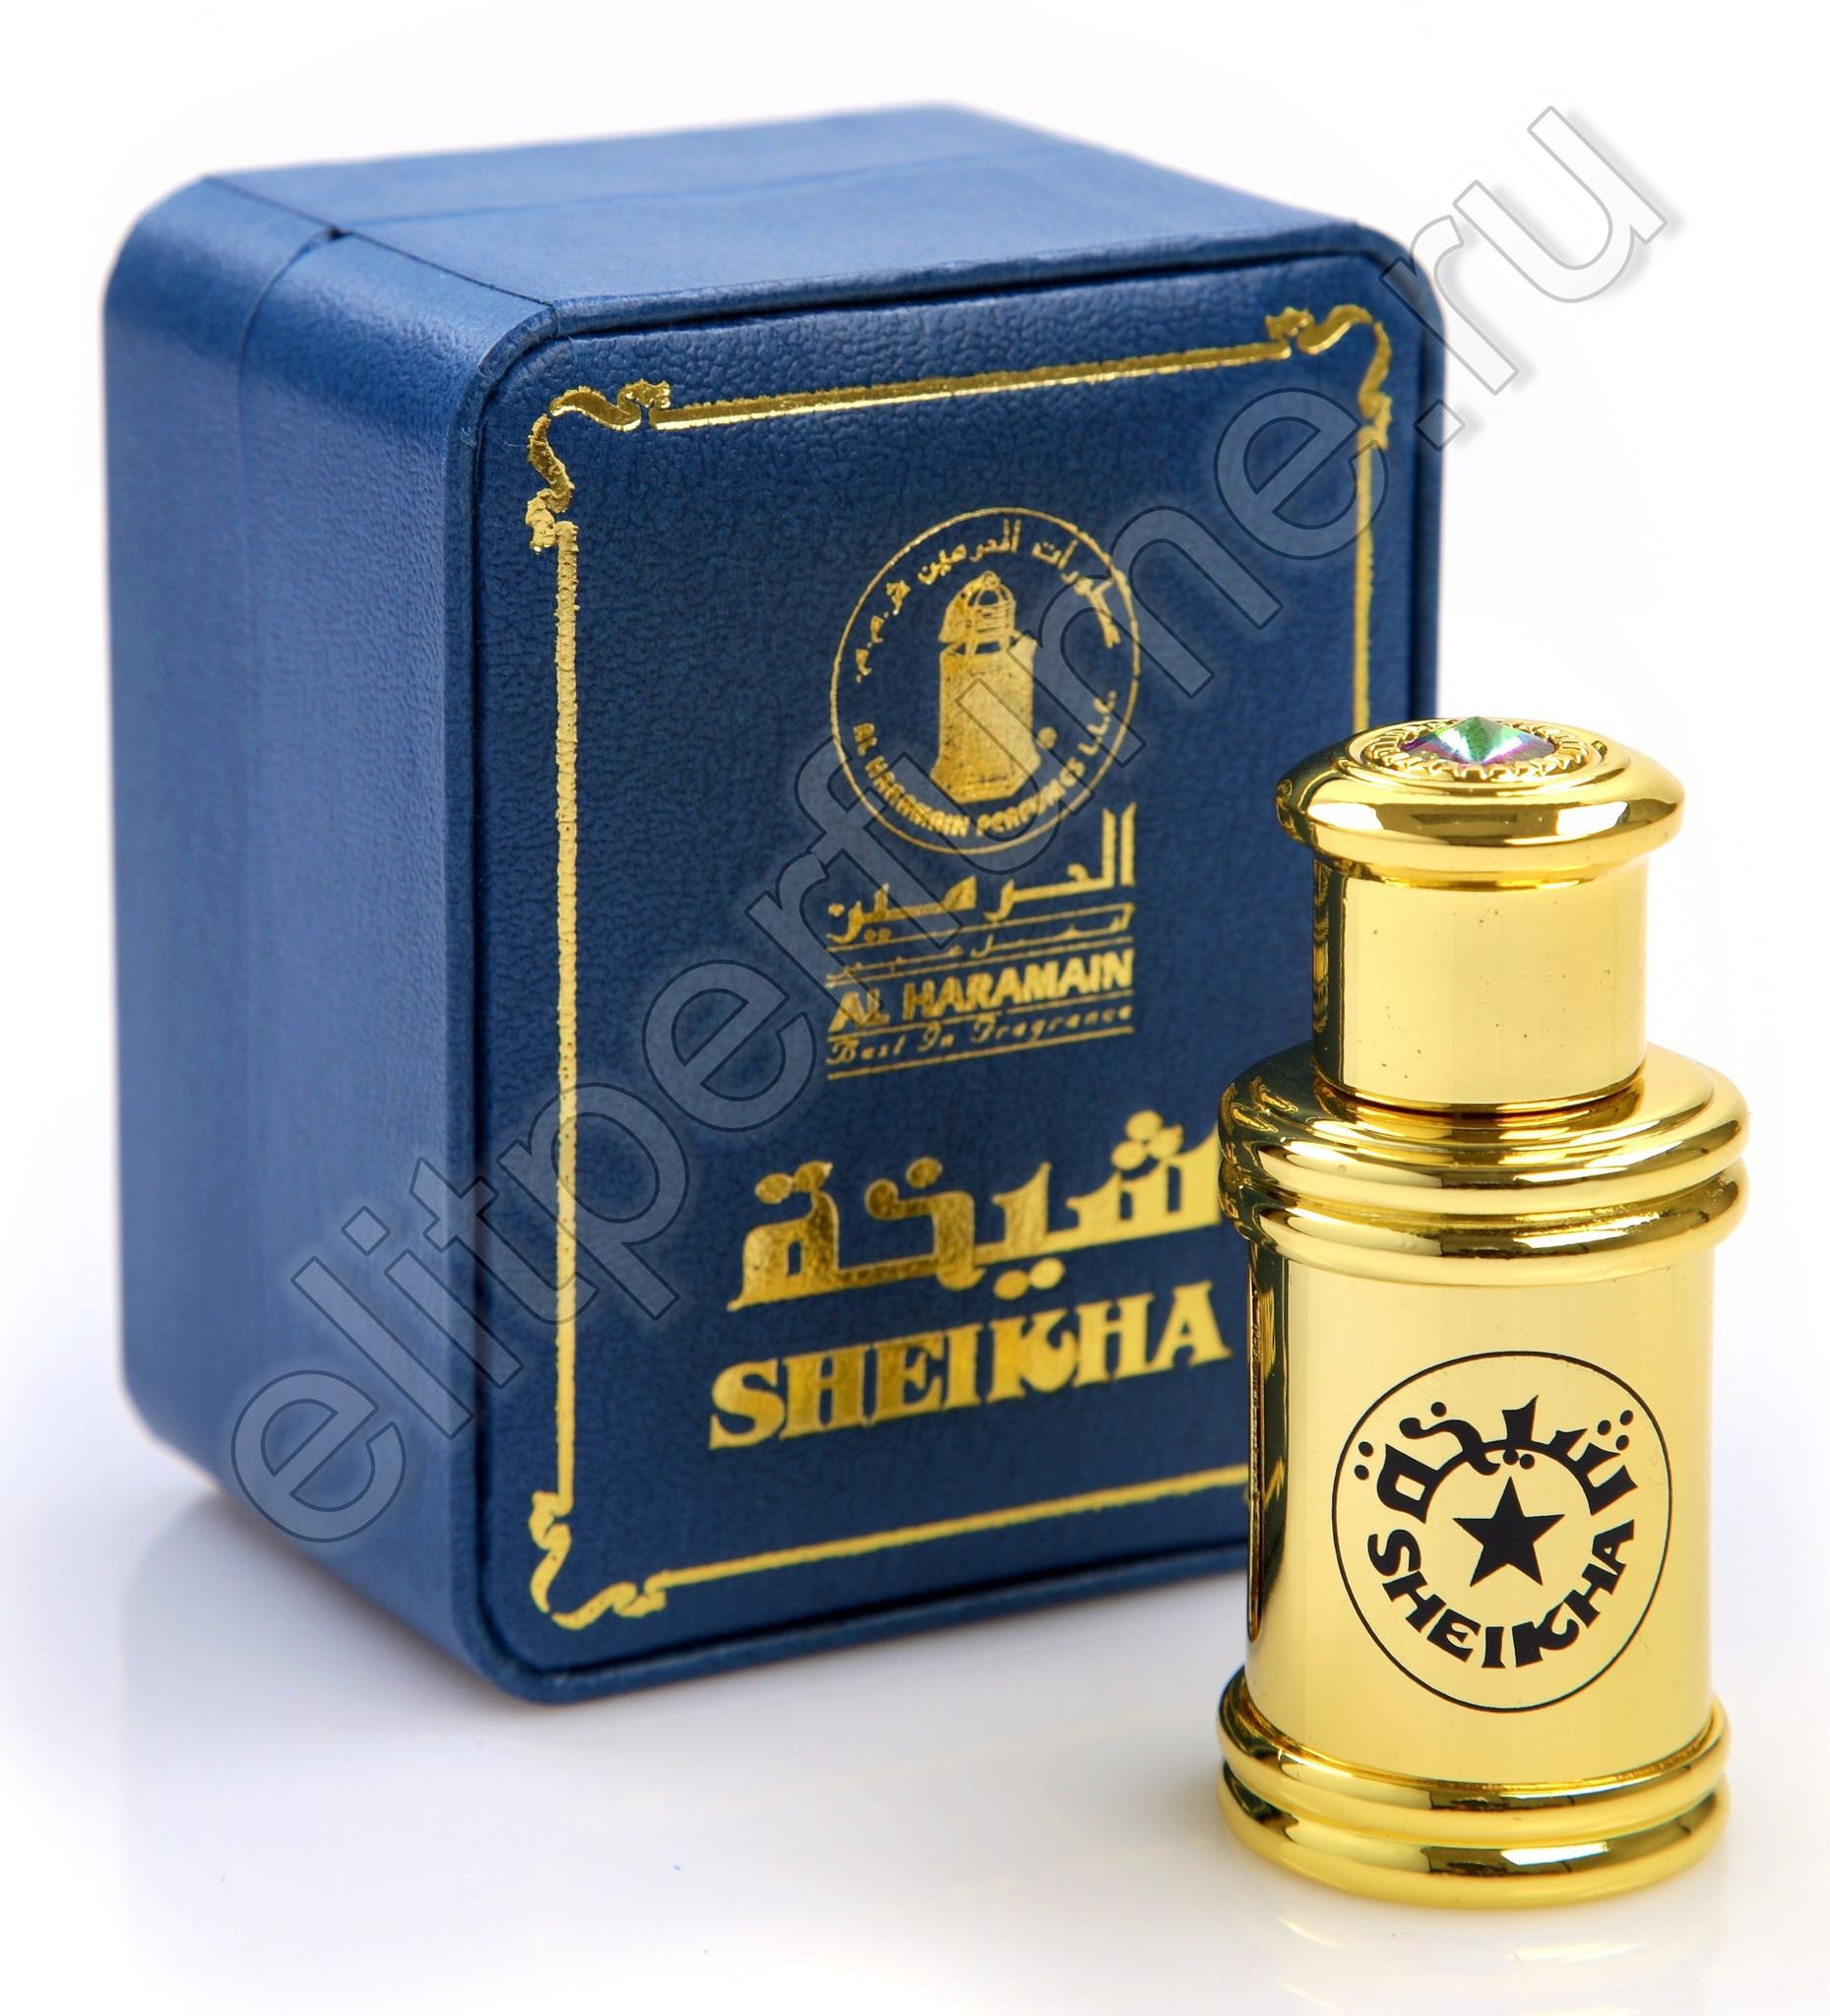 Шейха Sheikha 12 мл арабские масляные духи от Аль Харамайн Al Haramain Perfumes